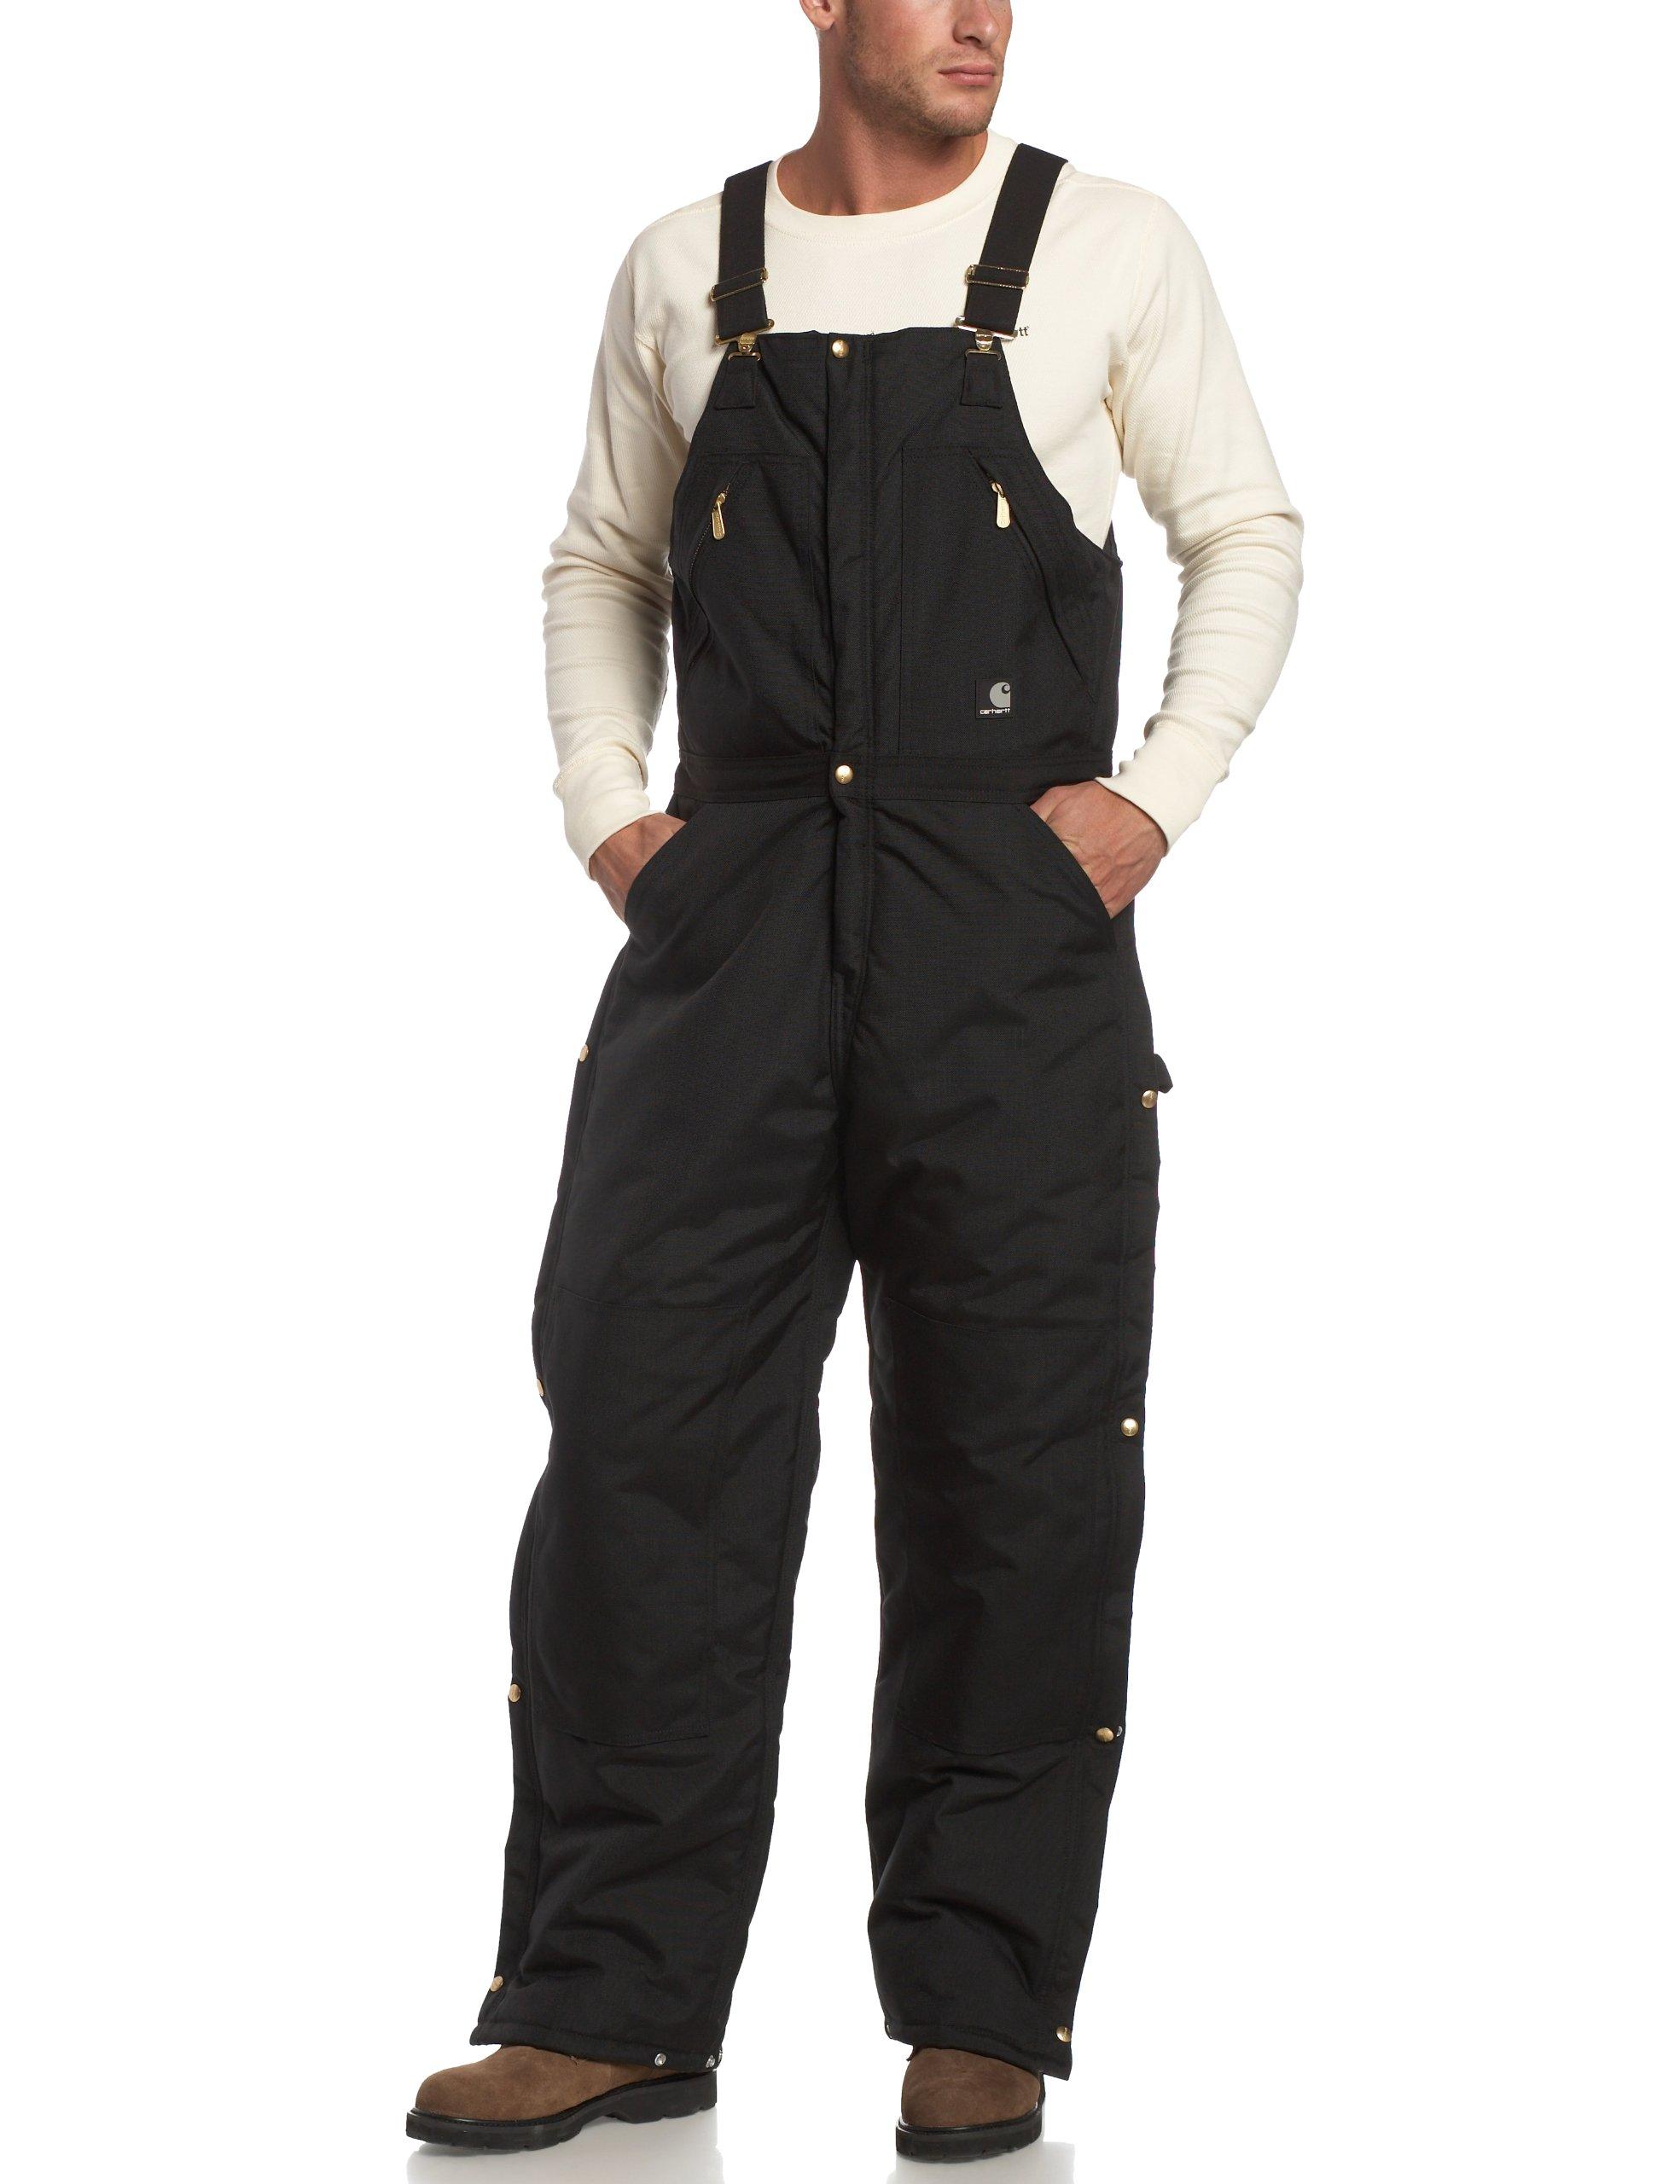 Carhartt Men's Yukon Arctic Quilt Lined Zip to Waist Biberalls,Black,32 x 30